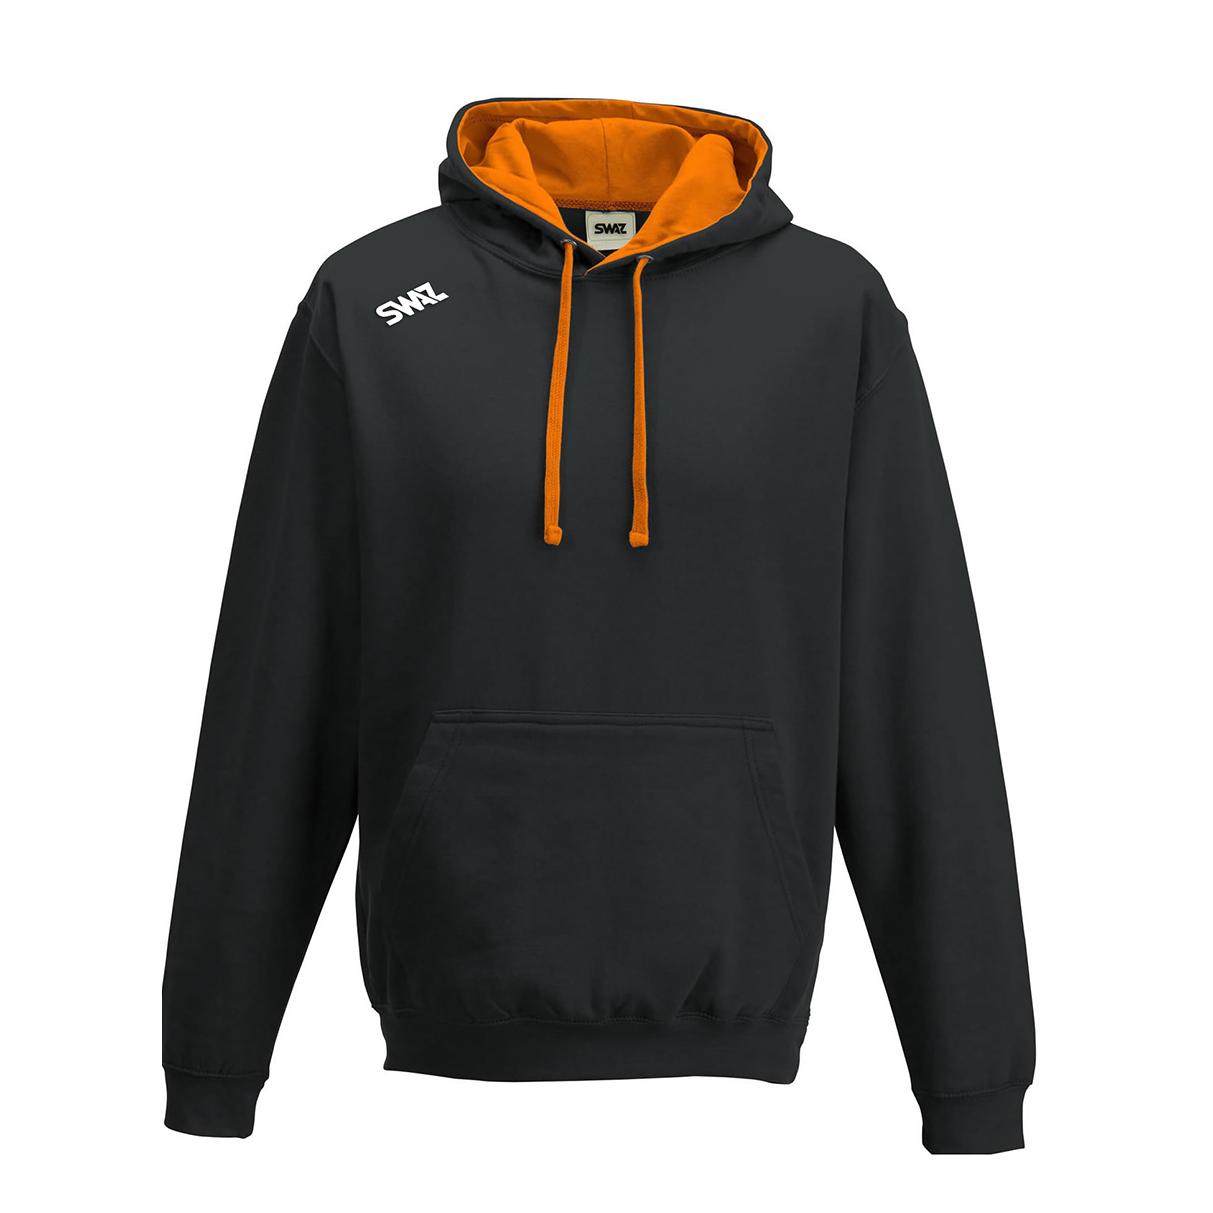 SWAZ Club Hoody – Black/Orange